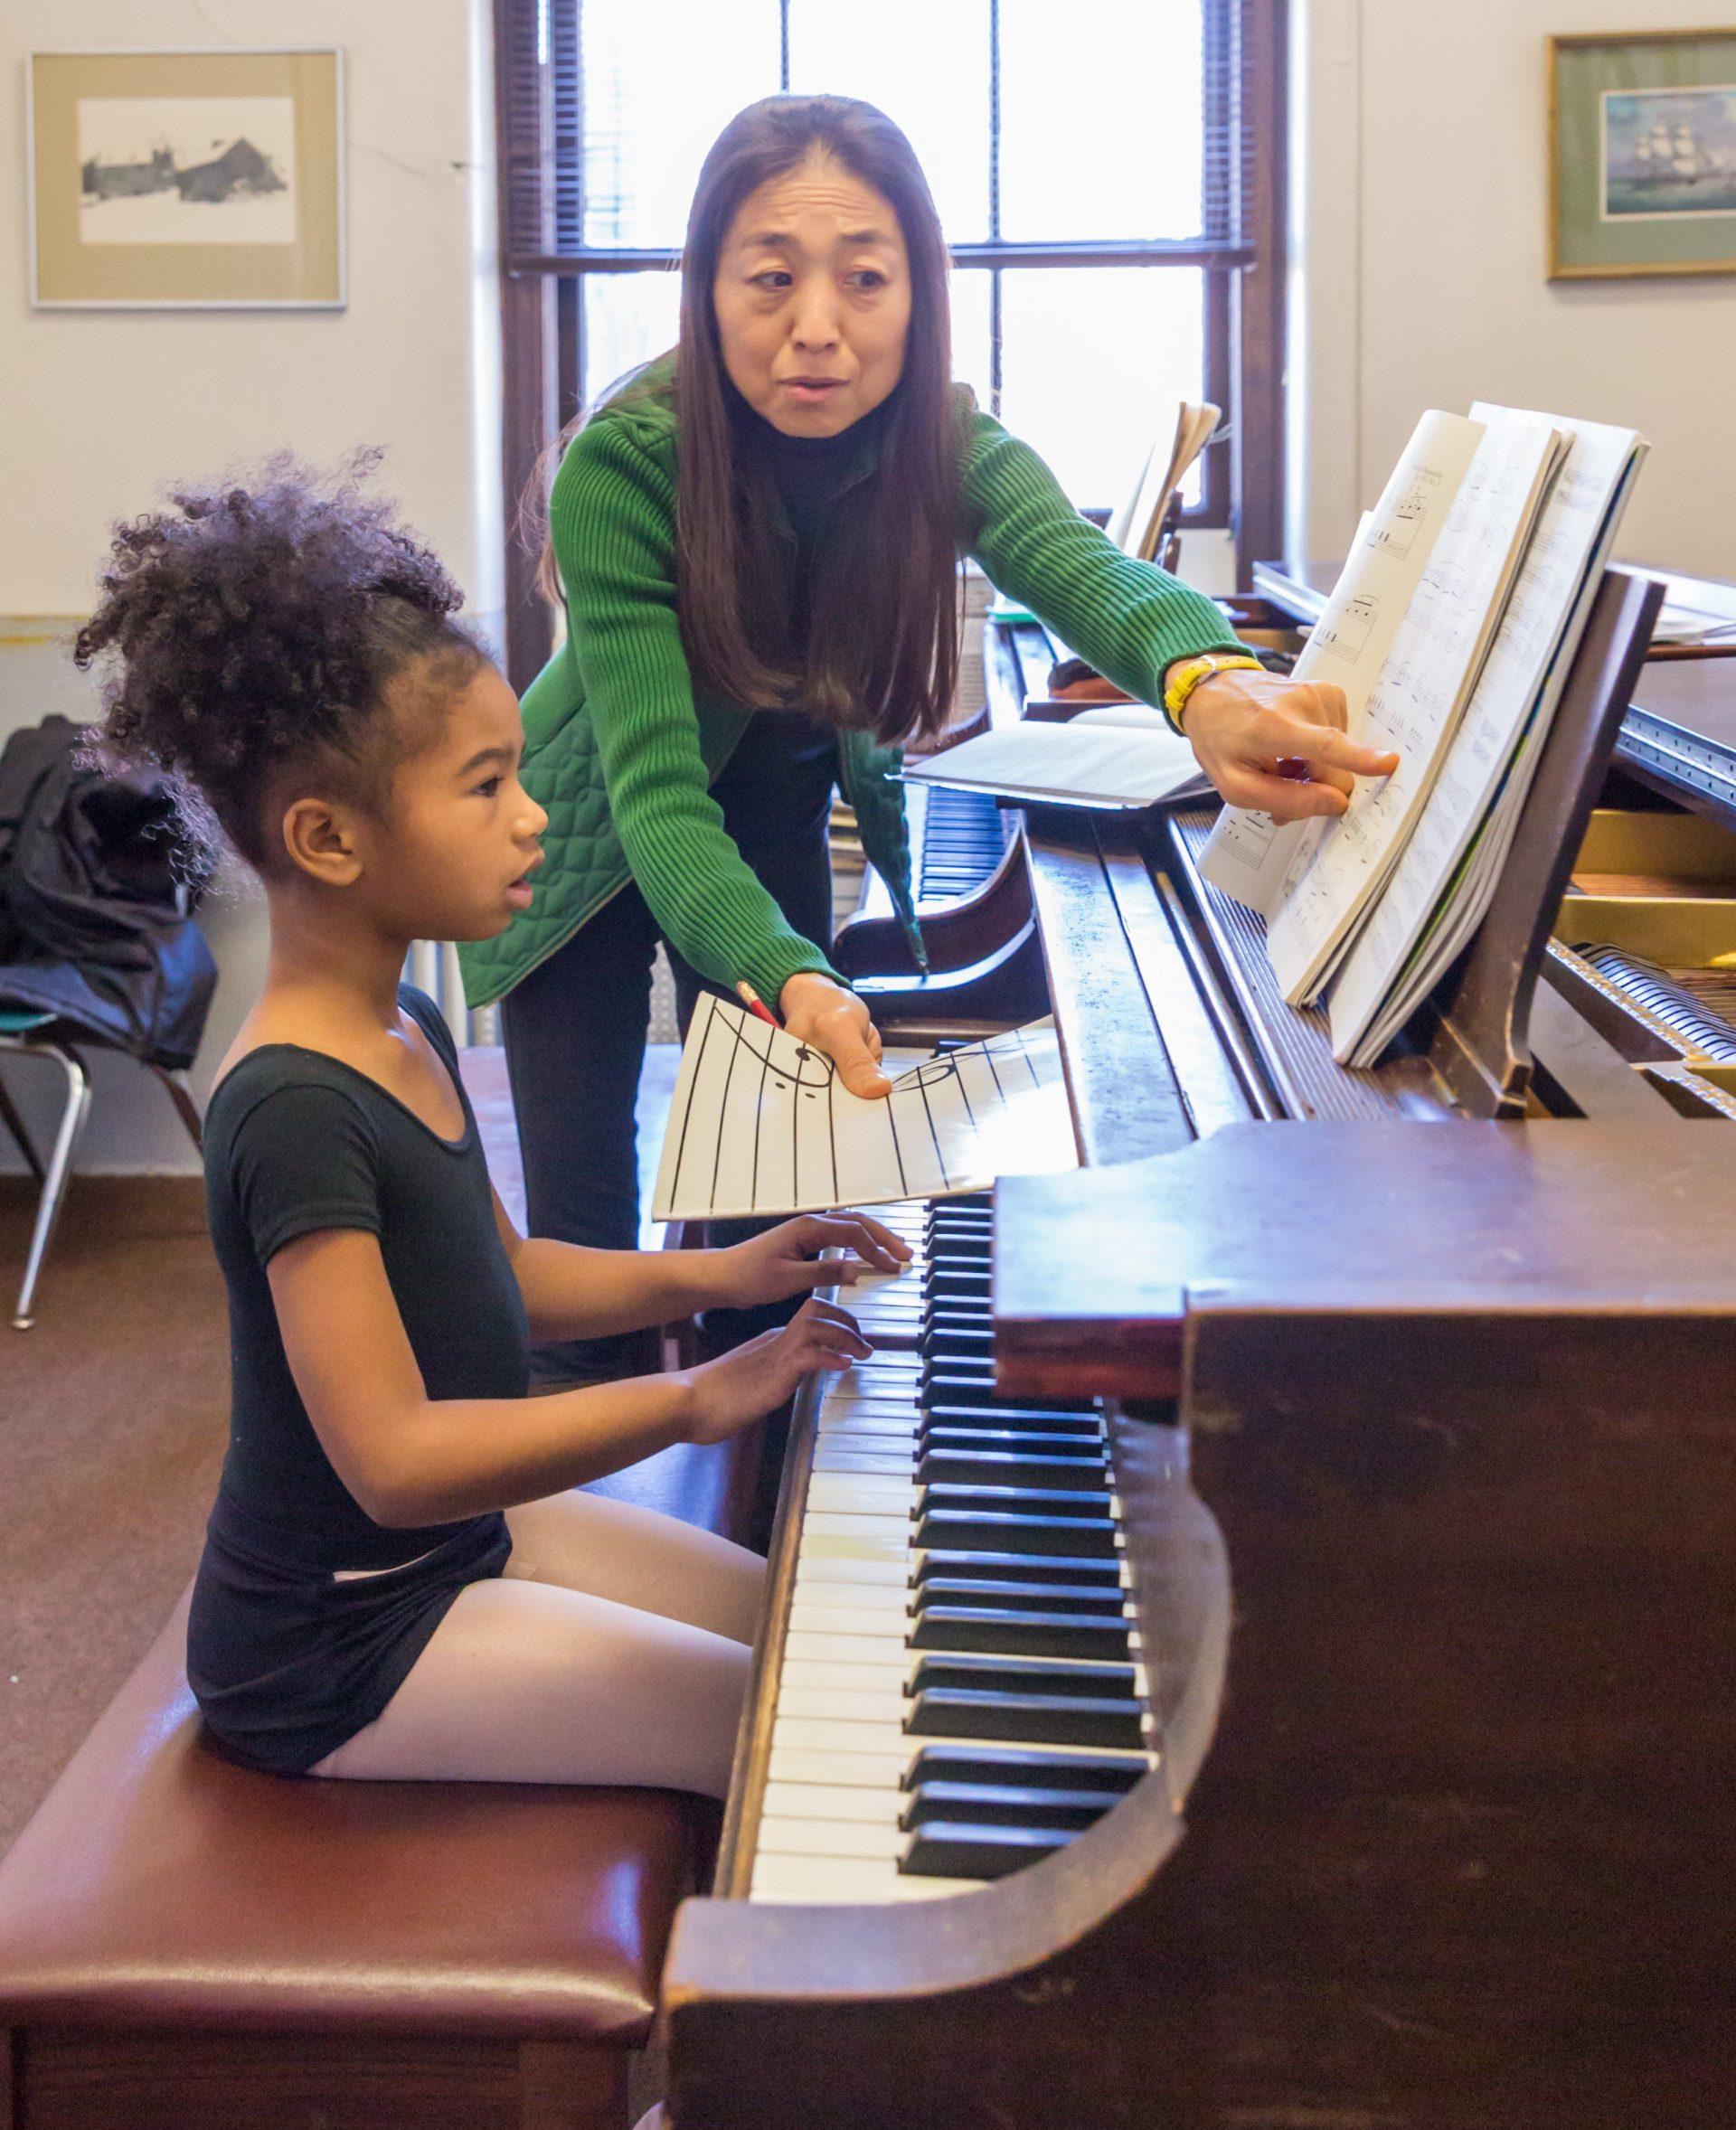 Settlement piano instruction